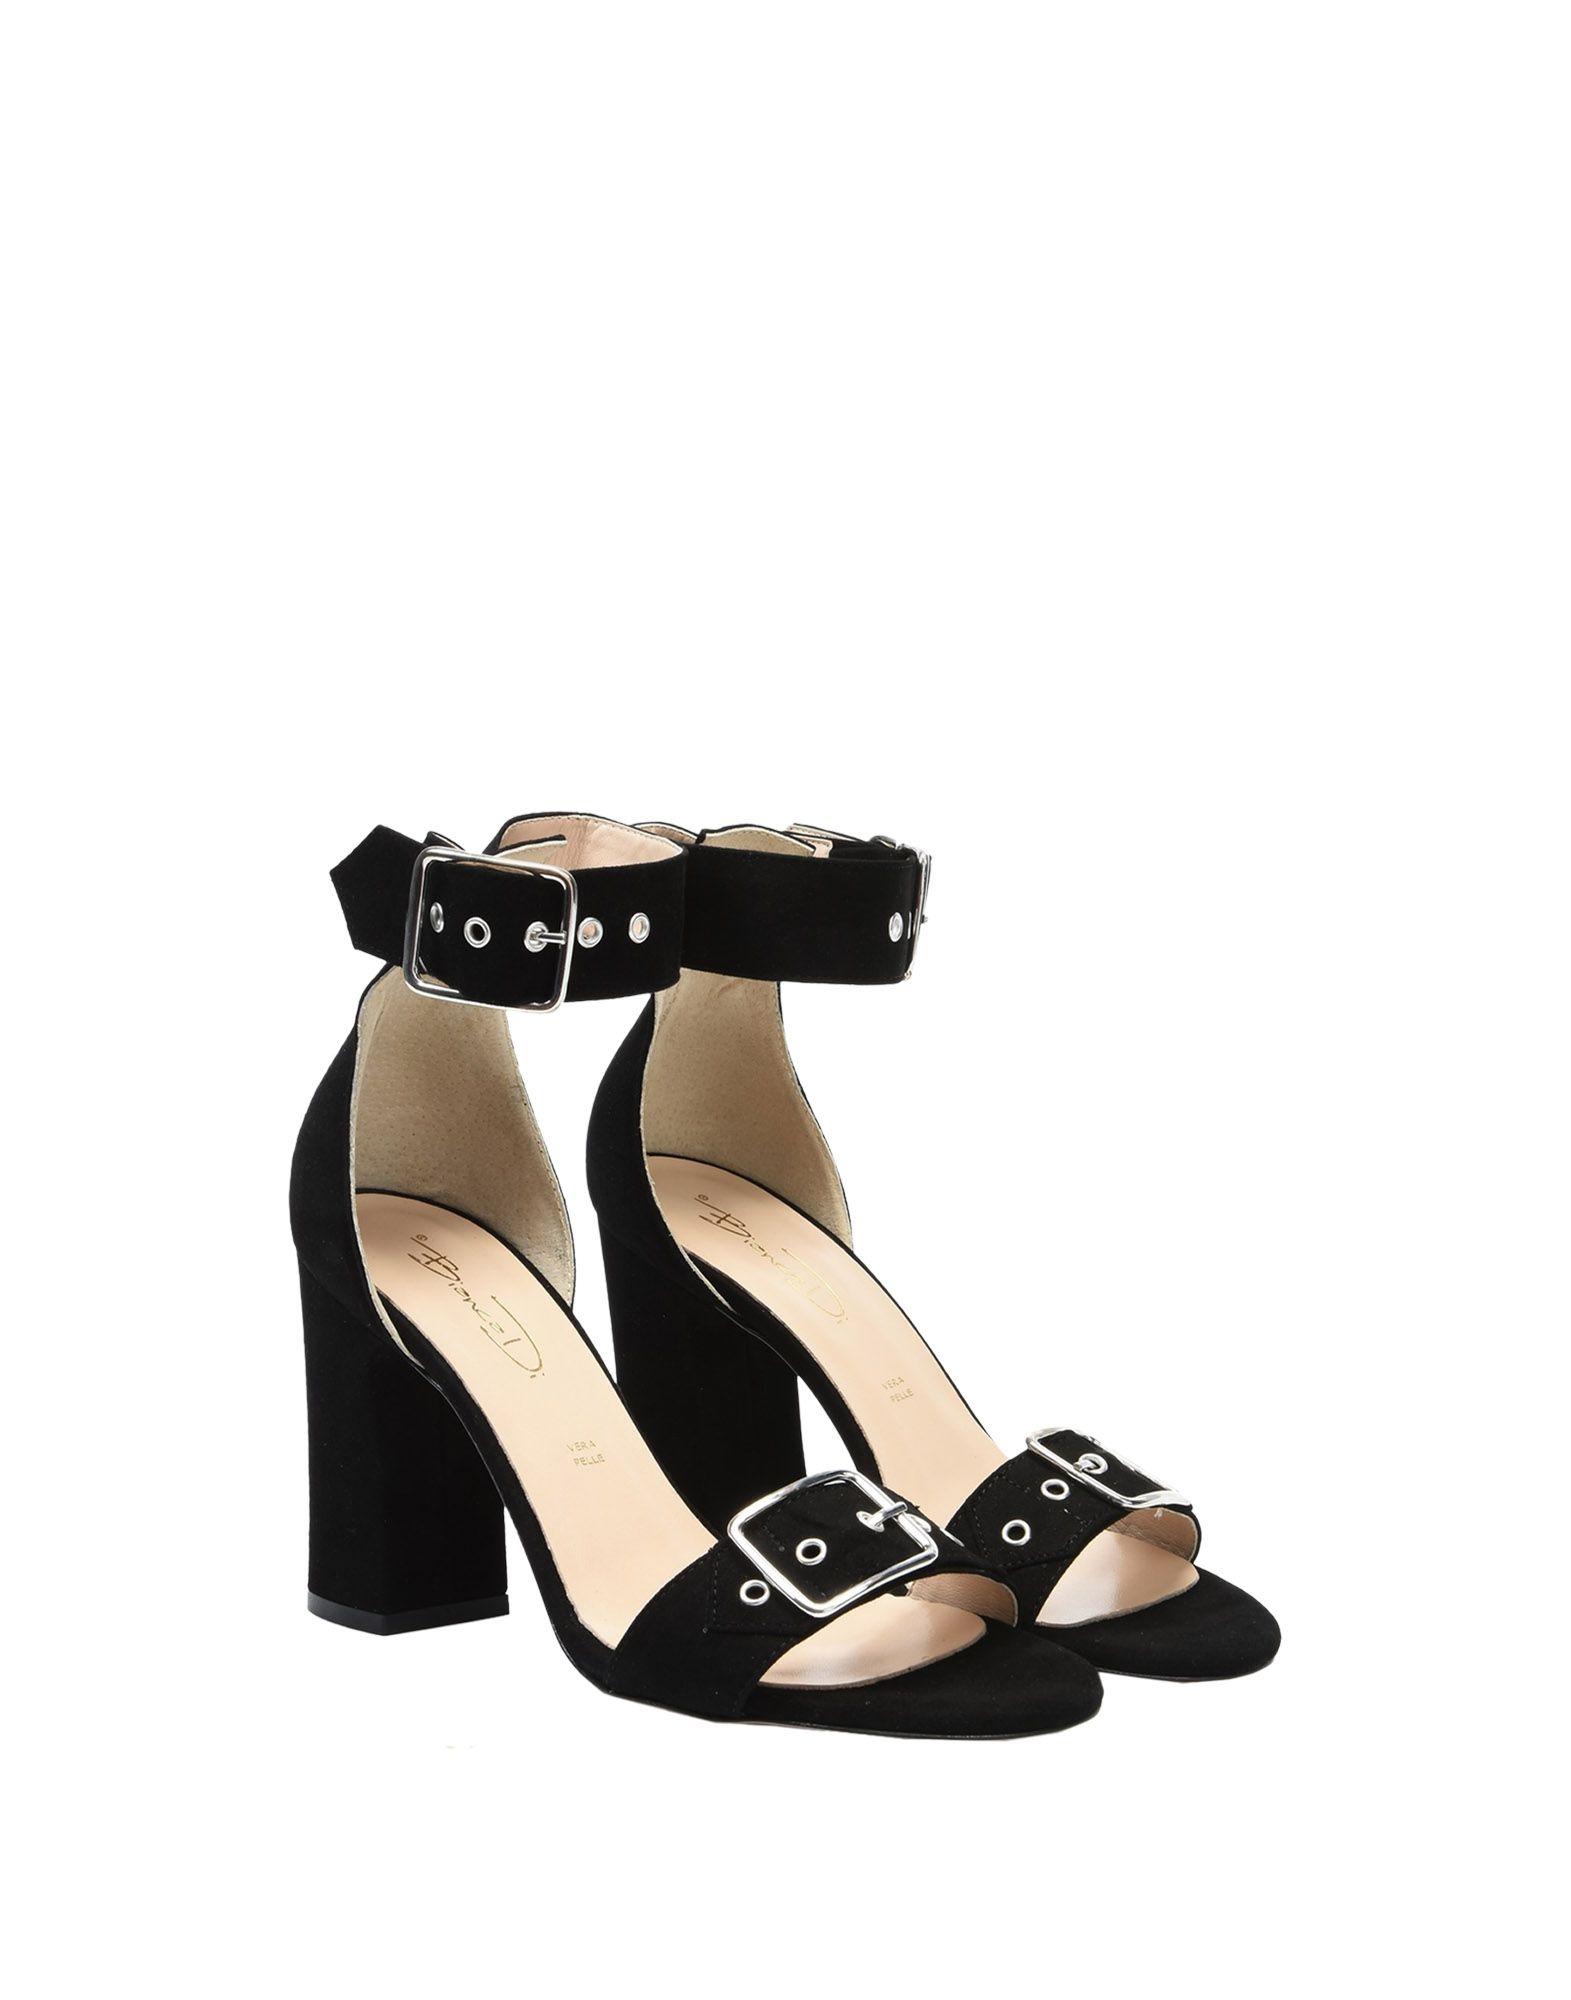 Bianca Di Sandalen Damen  11474934BU Gute Qualität beliebte Schuhe